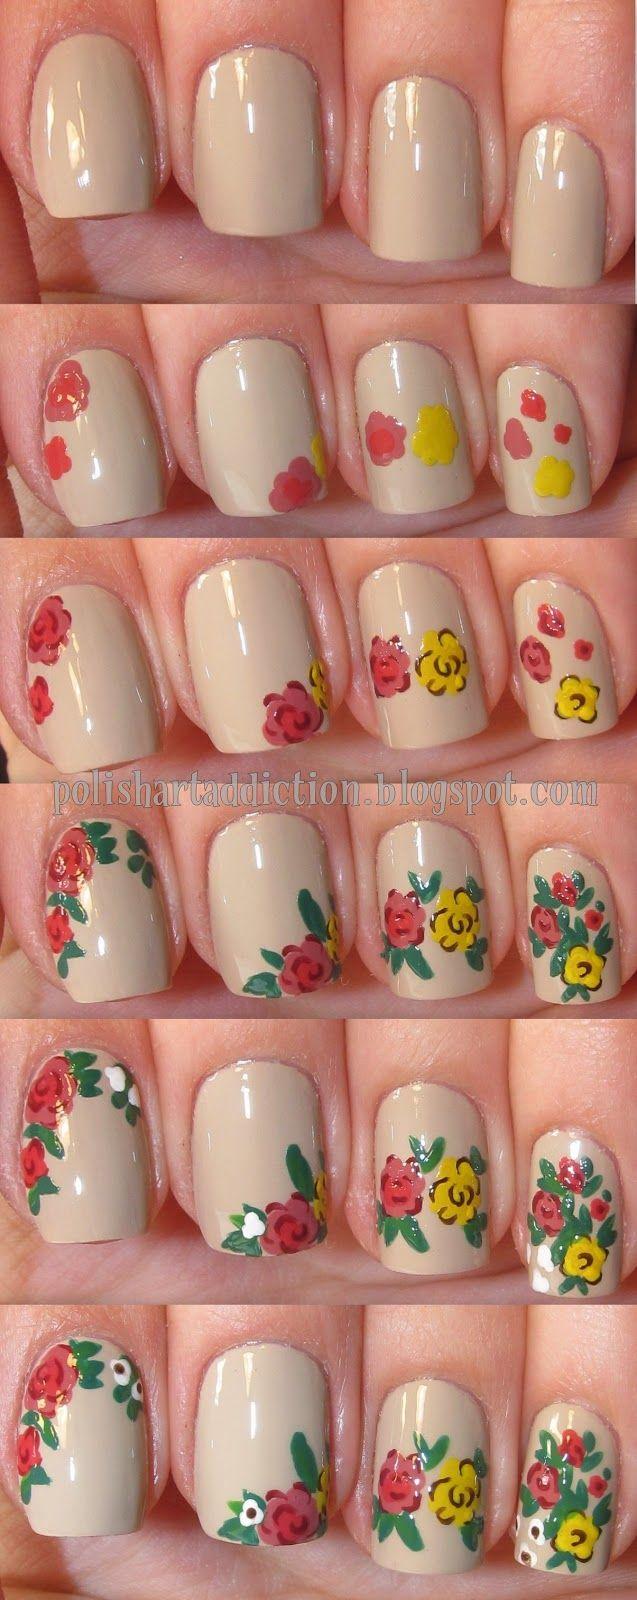 Pinned by simplenailarttips tutorials nail art design simplenailarttips tutorials nail art design ideas polish art prinsesfo Image collections